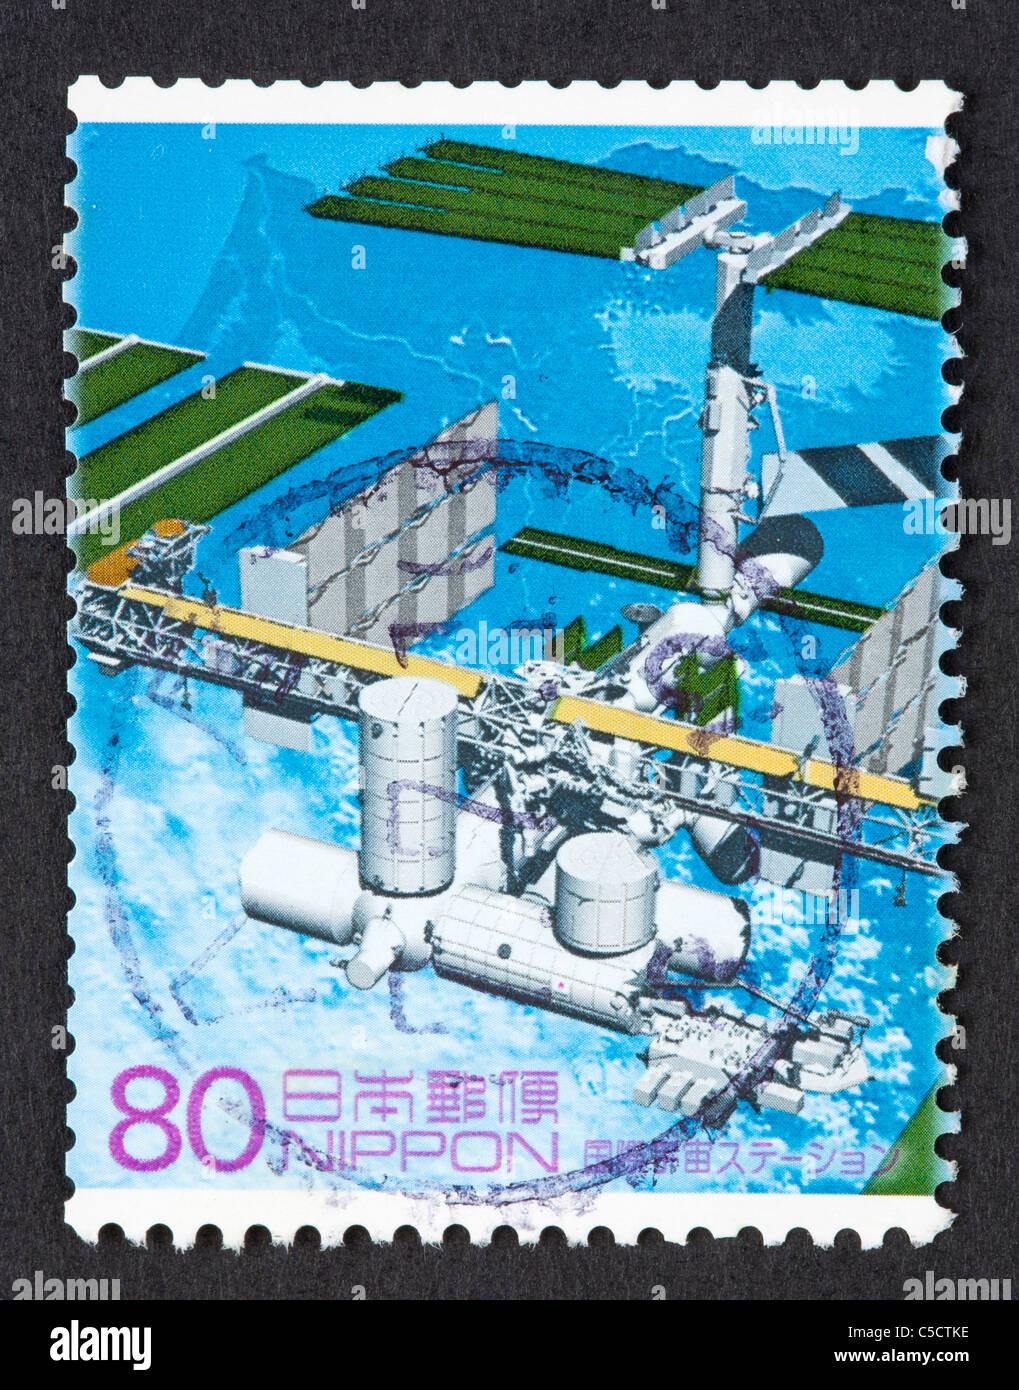 Japanese postage stamp - Stock Image